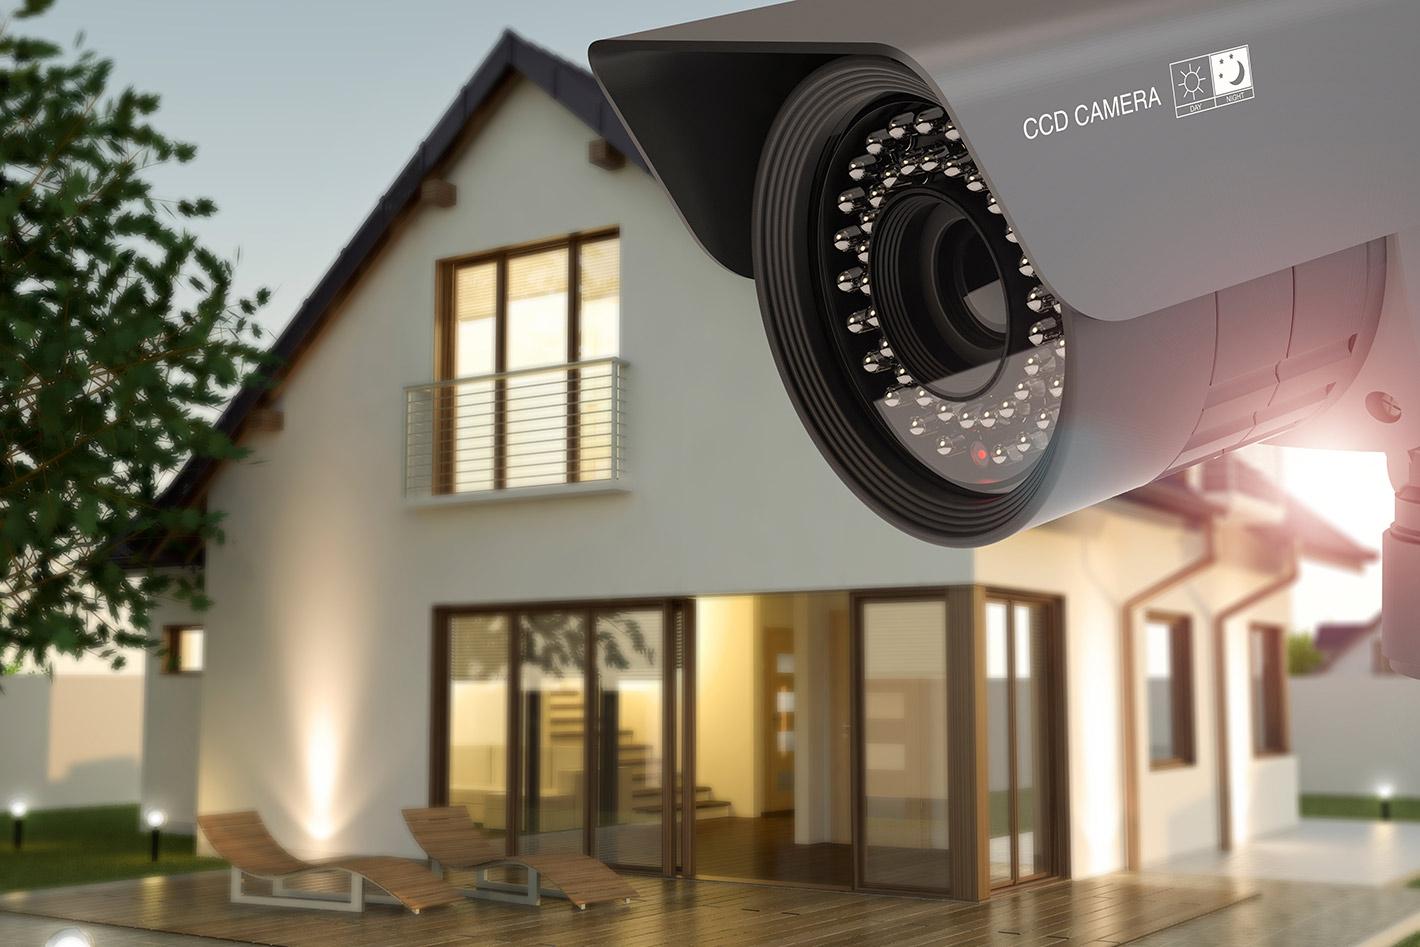 Amcrest Outdoor Wi-Fi Cameras